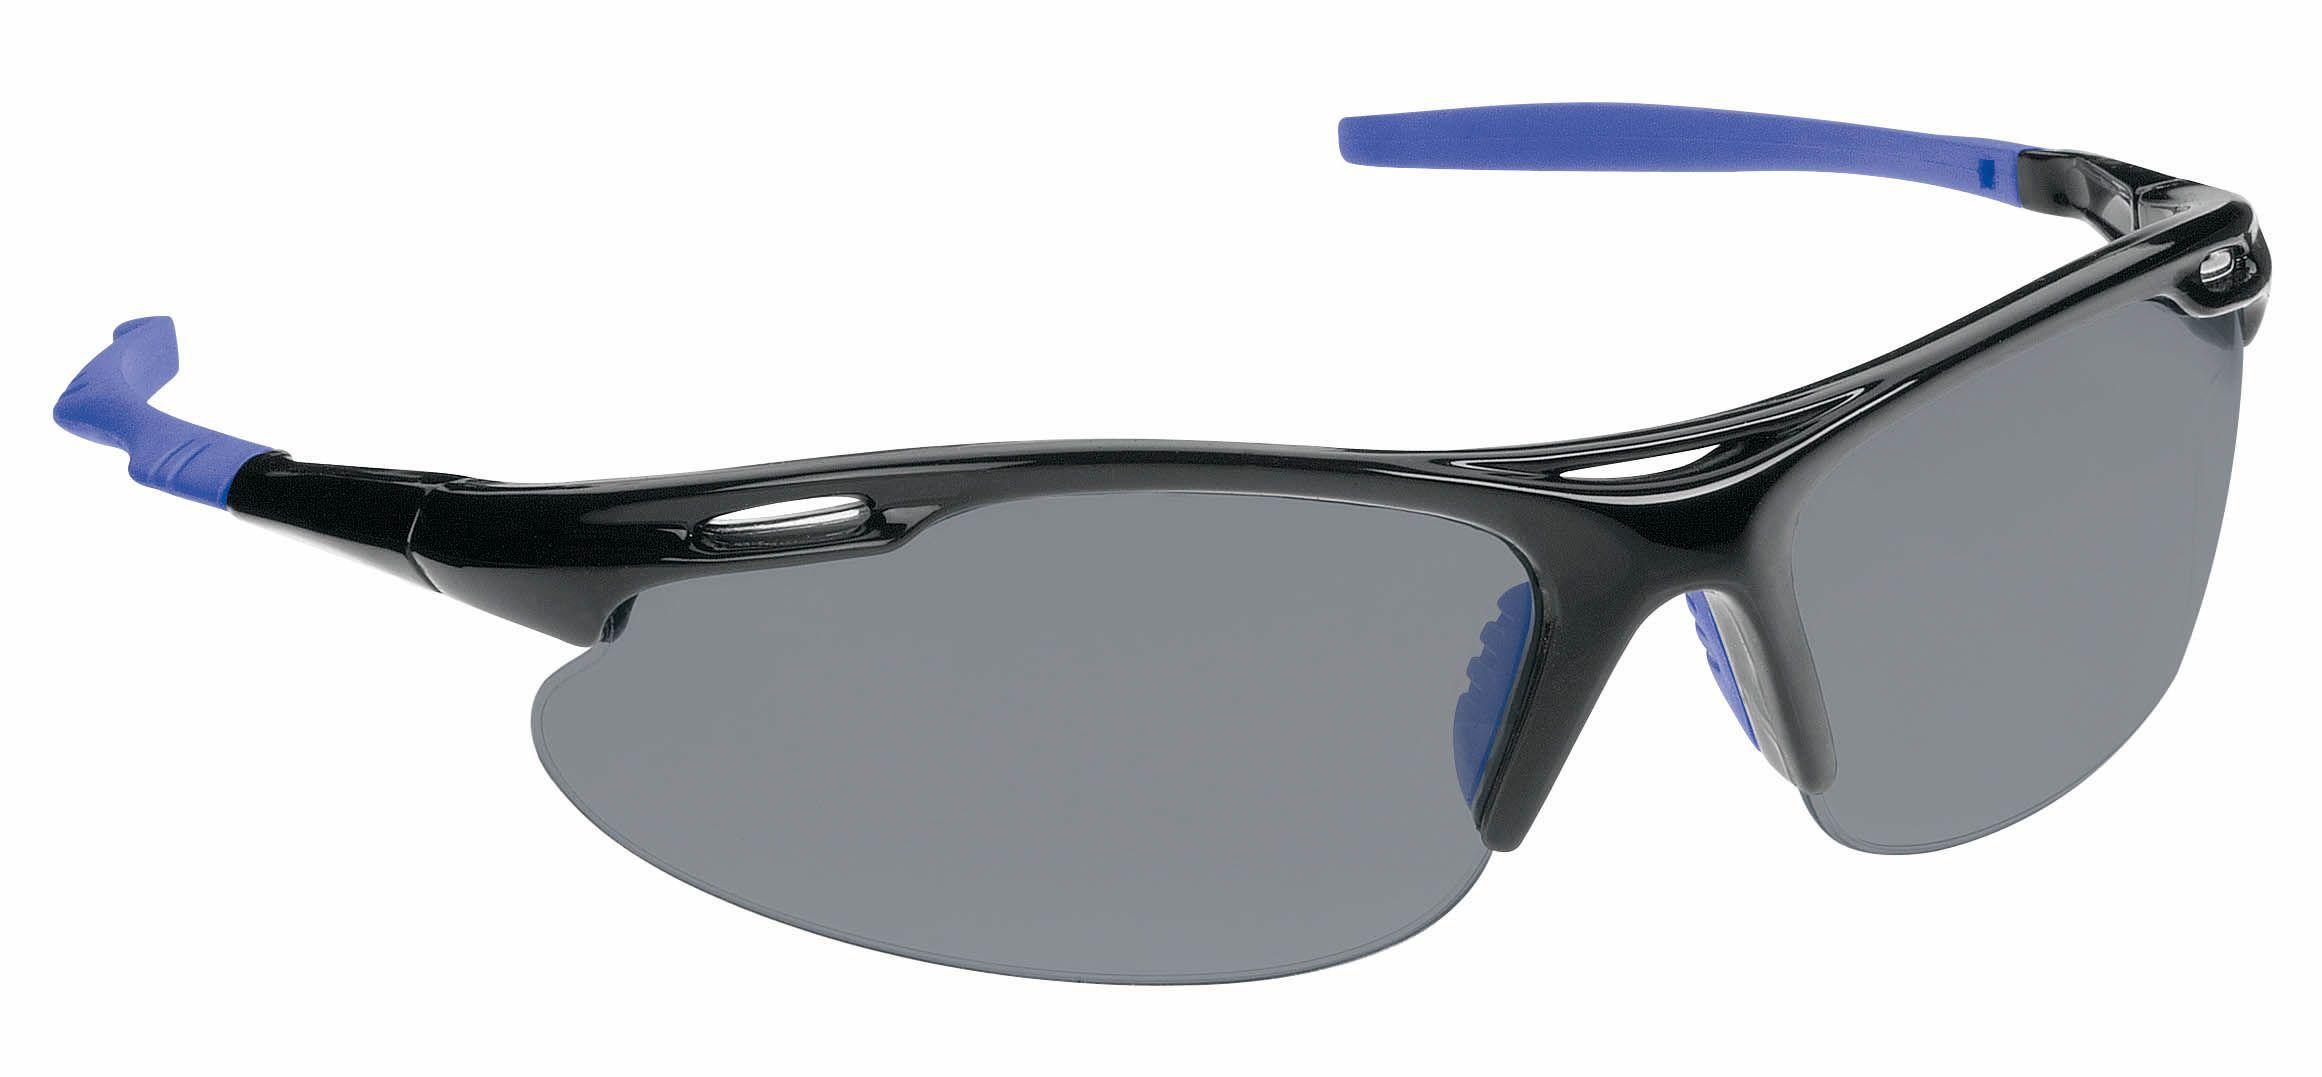 Jsp Smoke Safety Spectacles